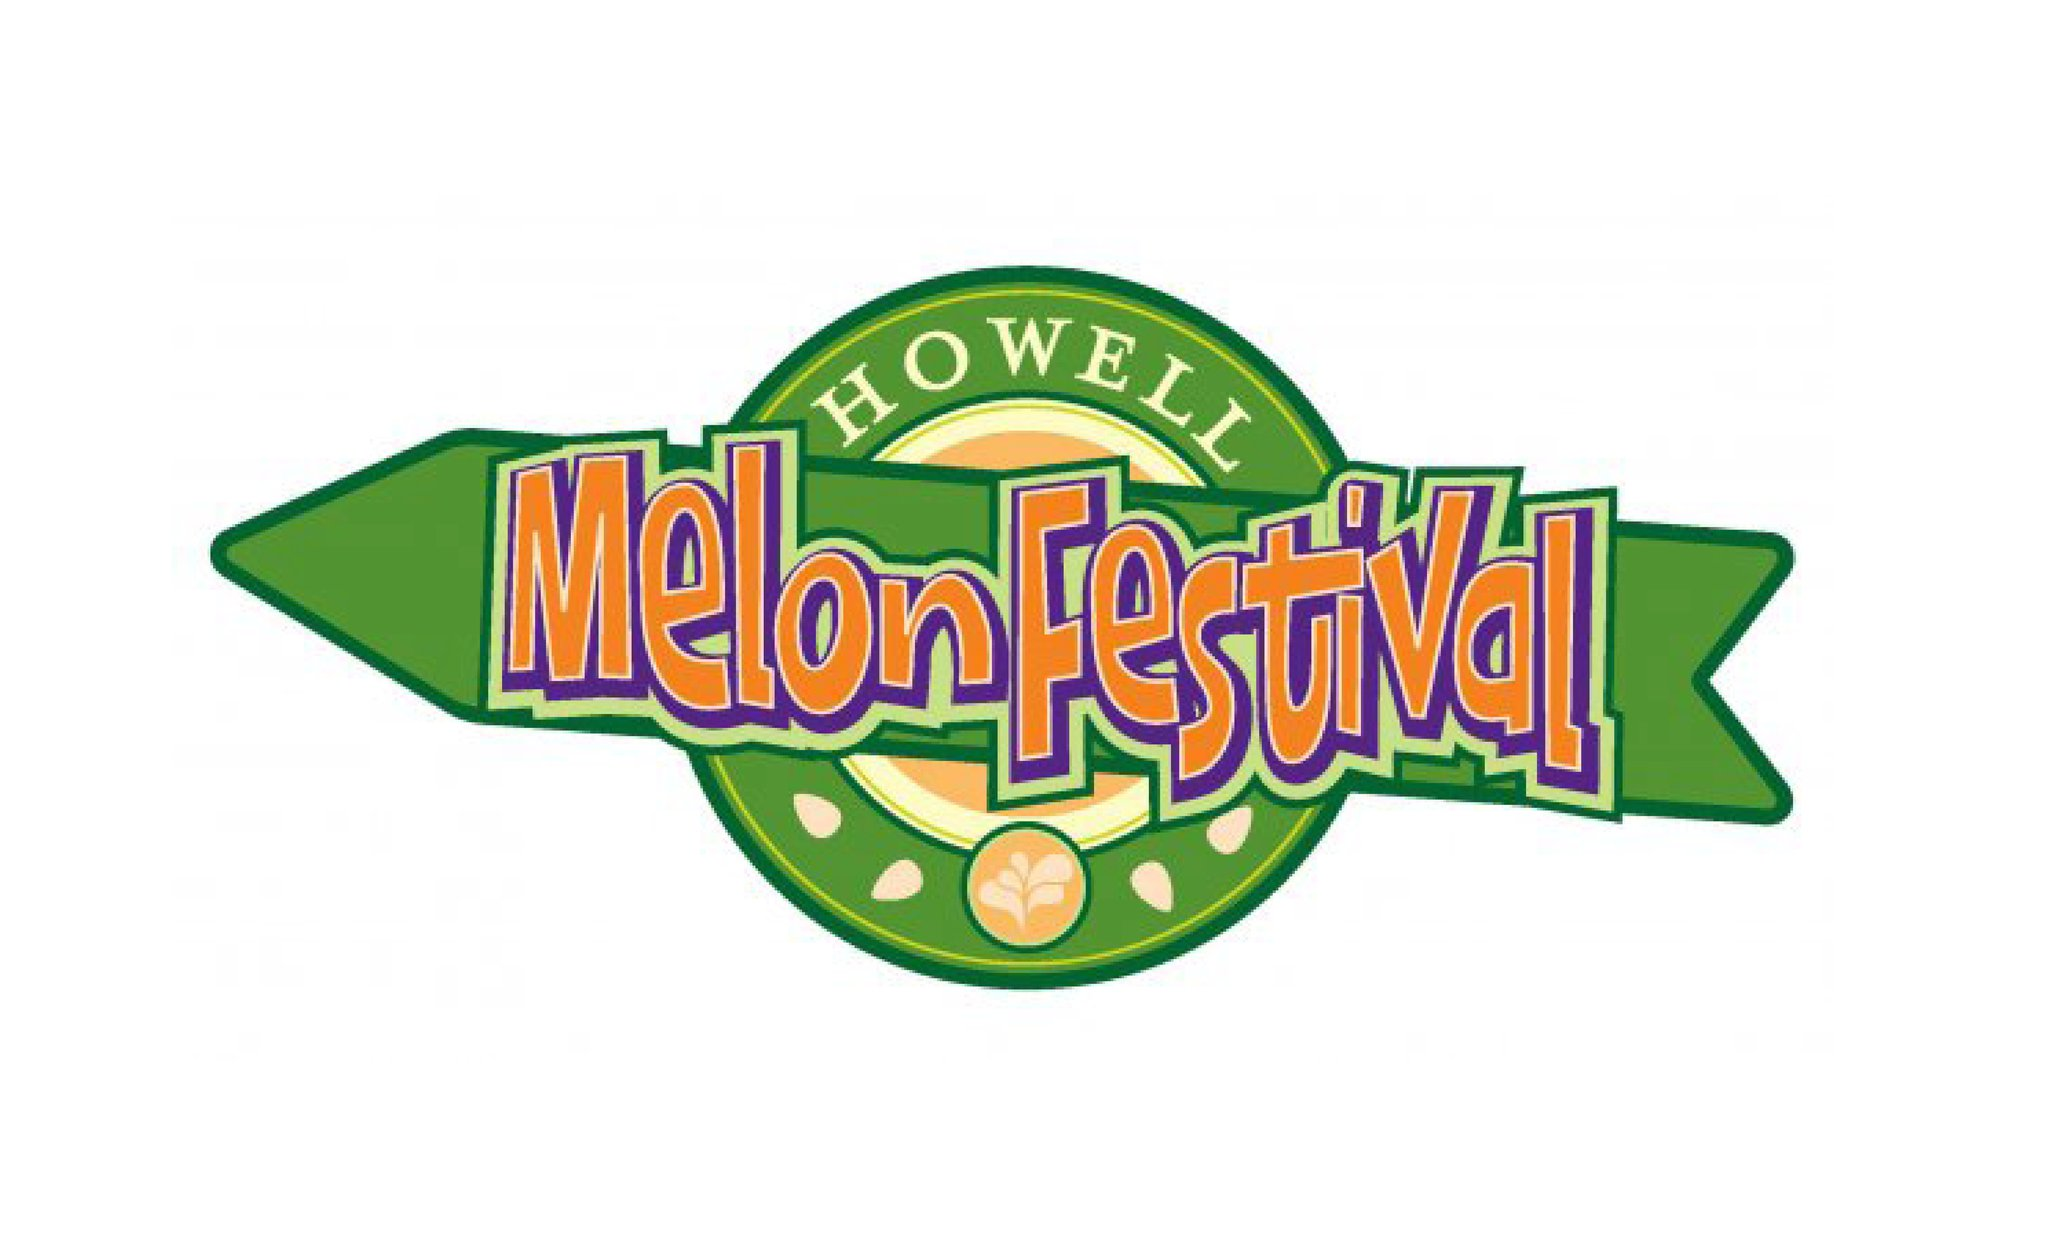 266390 10150260093168856 326669813855 7385438 6686432 o Day 74: Howell Melon Festival